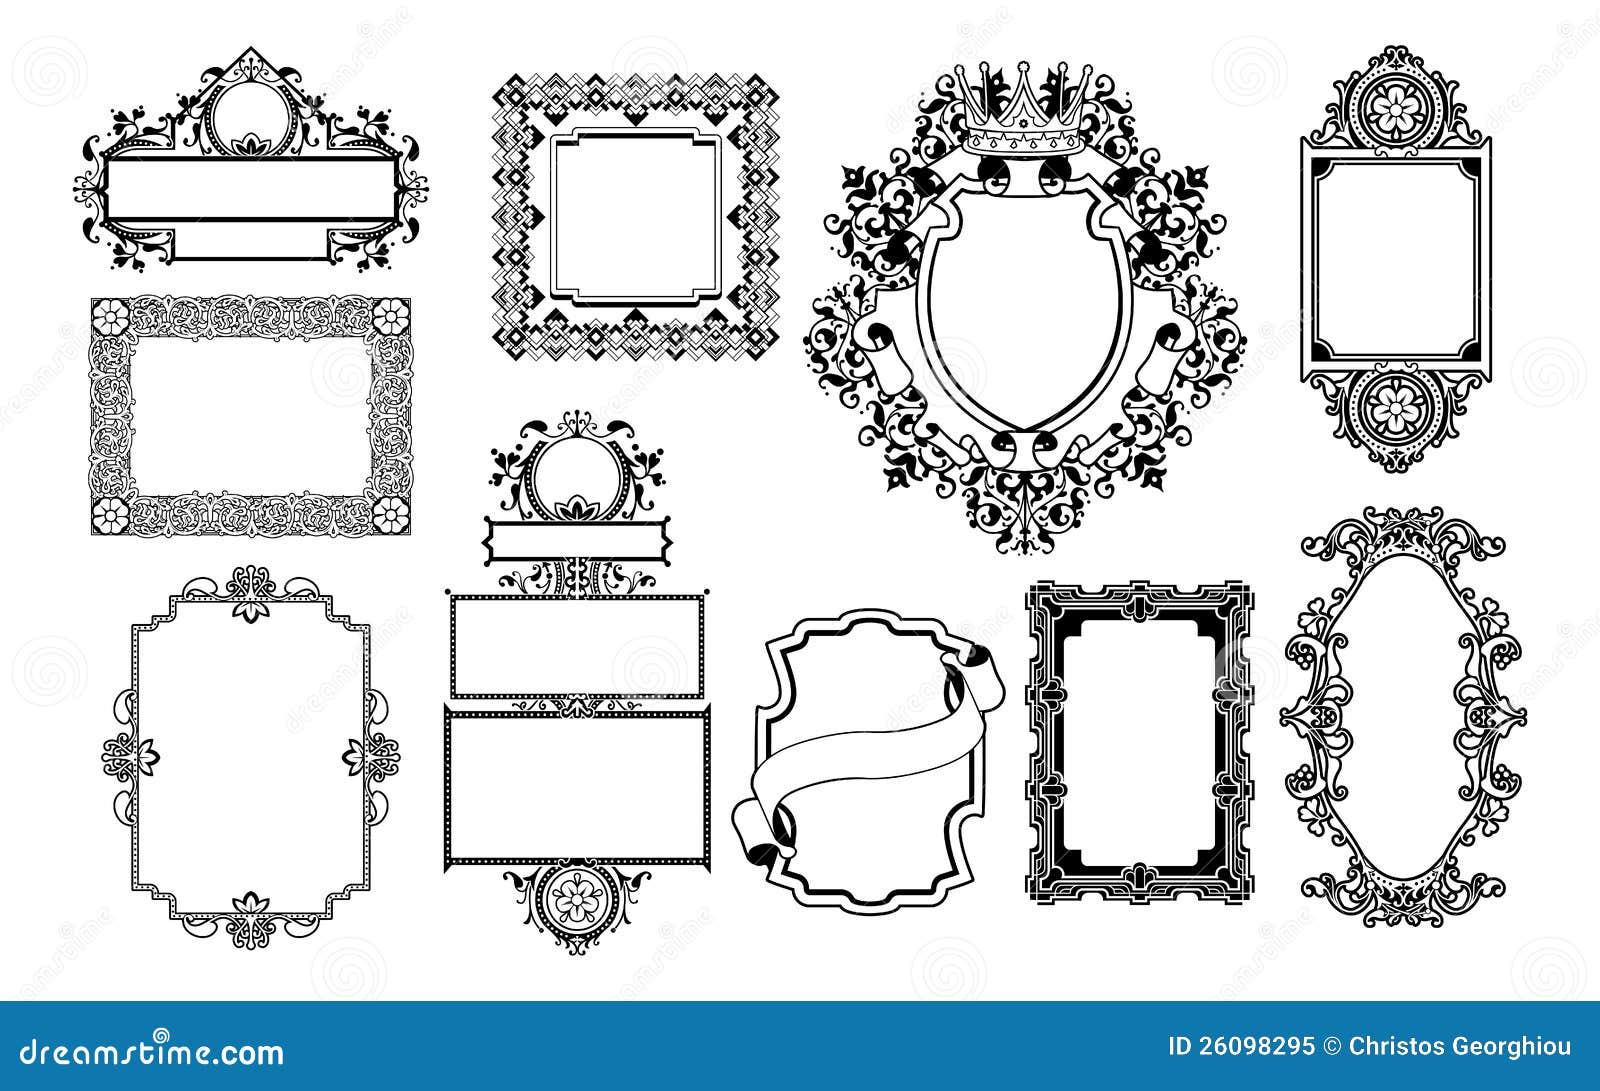 Graphic Design Decorative Frames Stock Vector - Illustration of ...